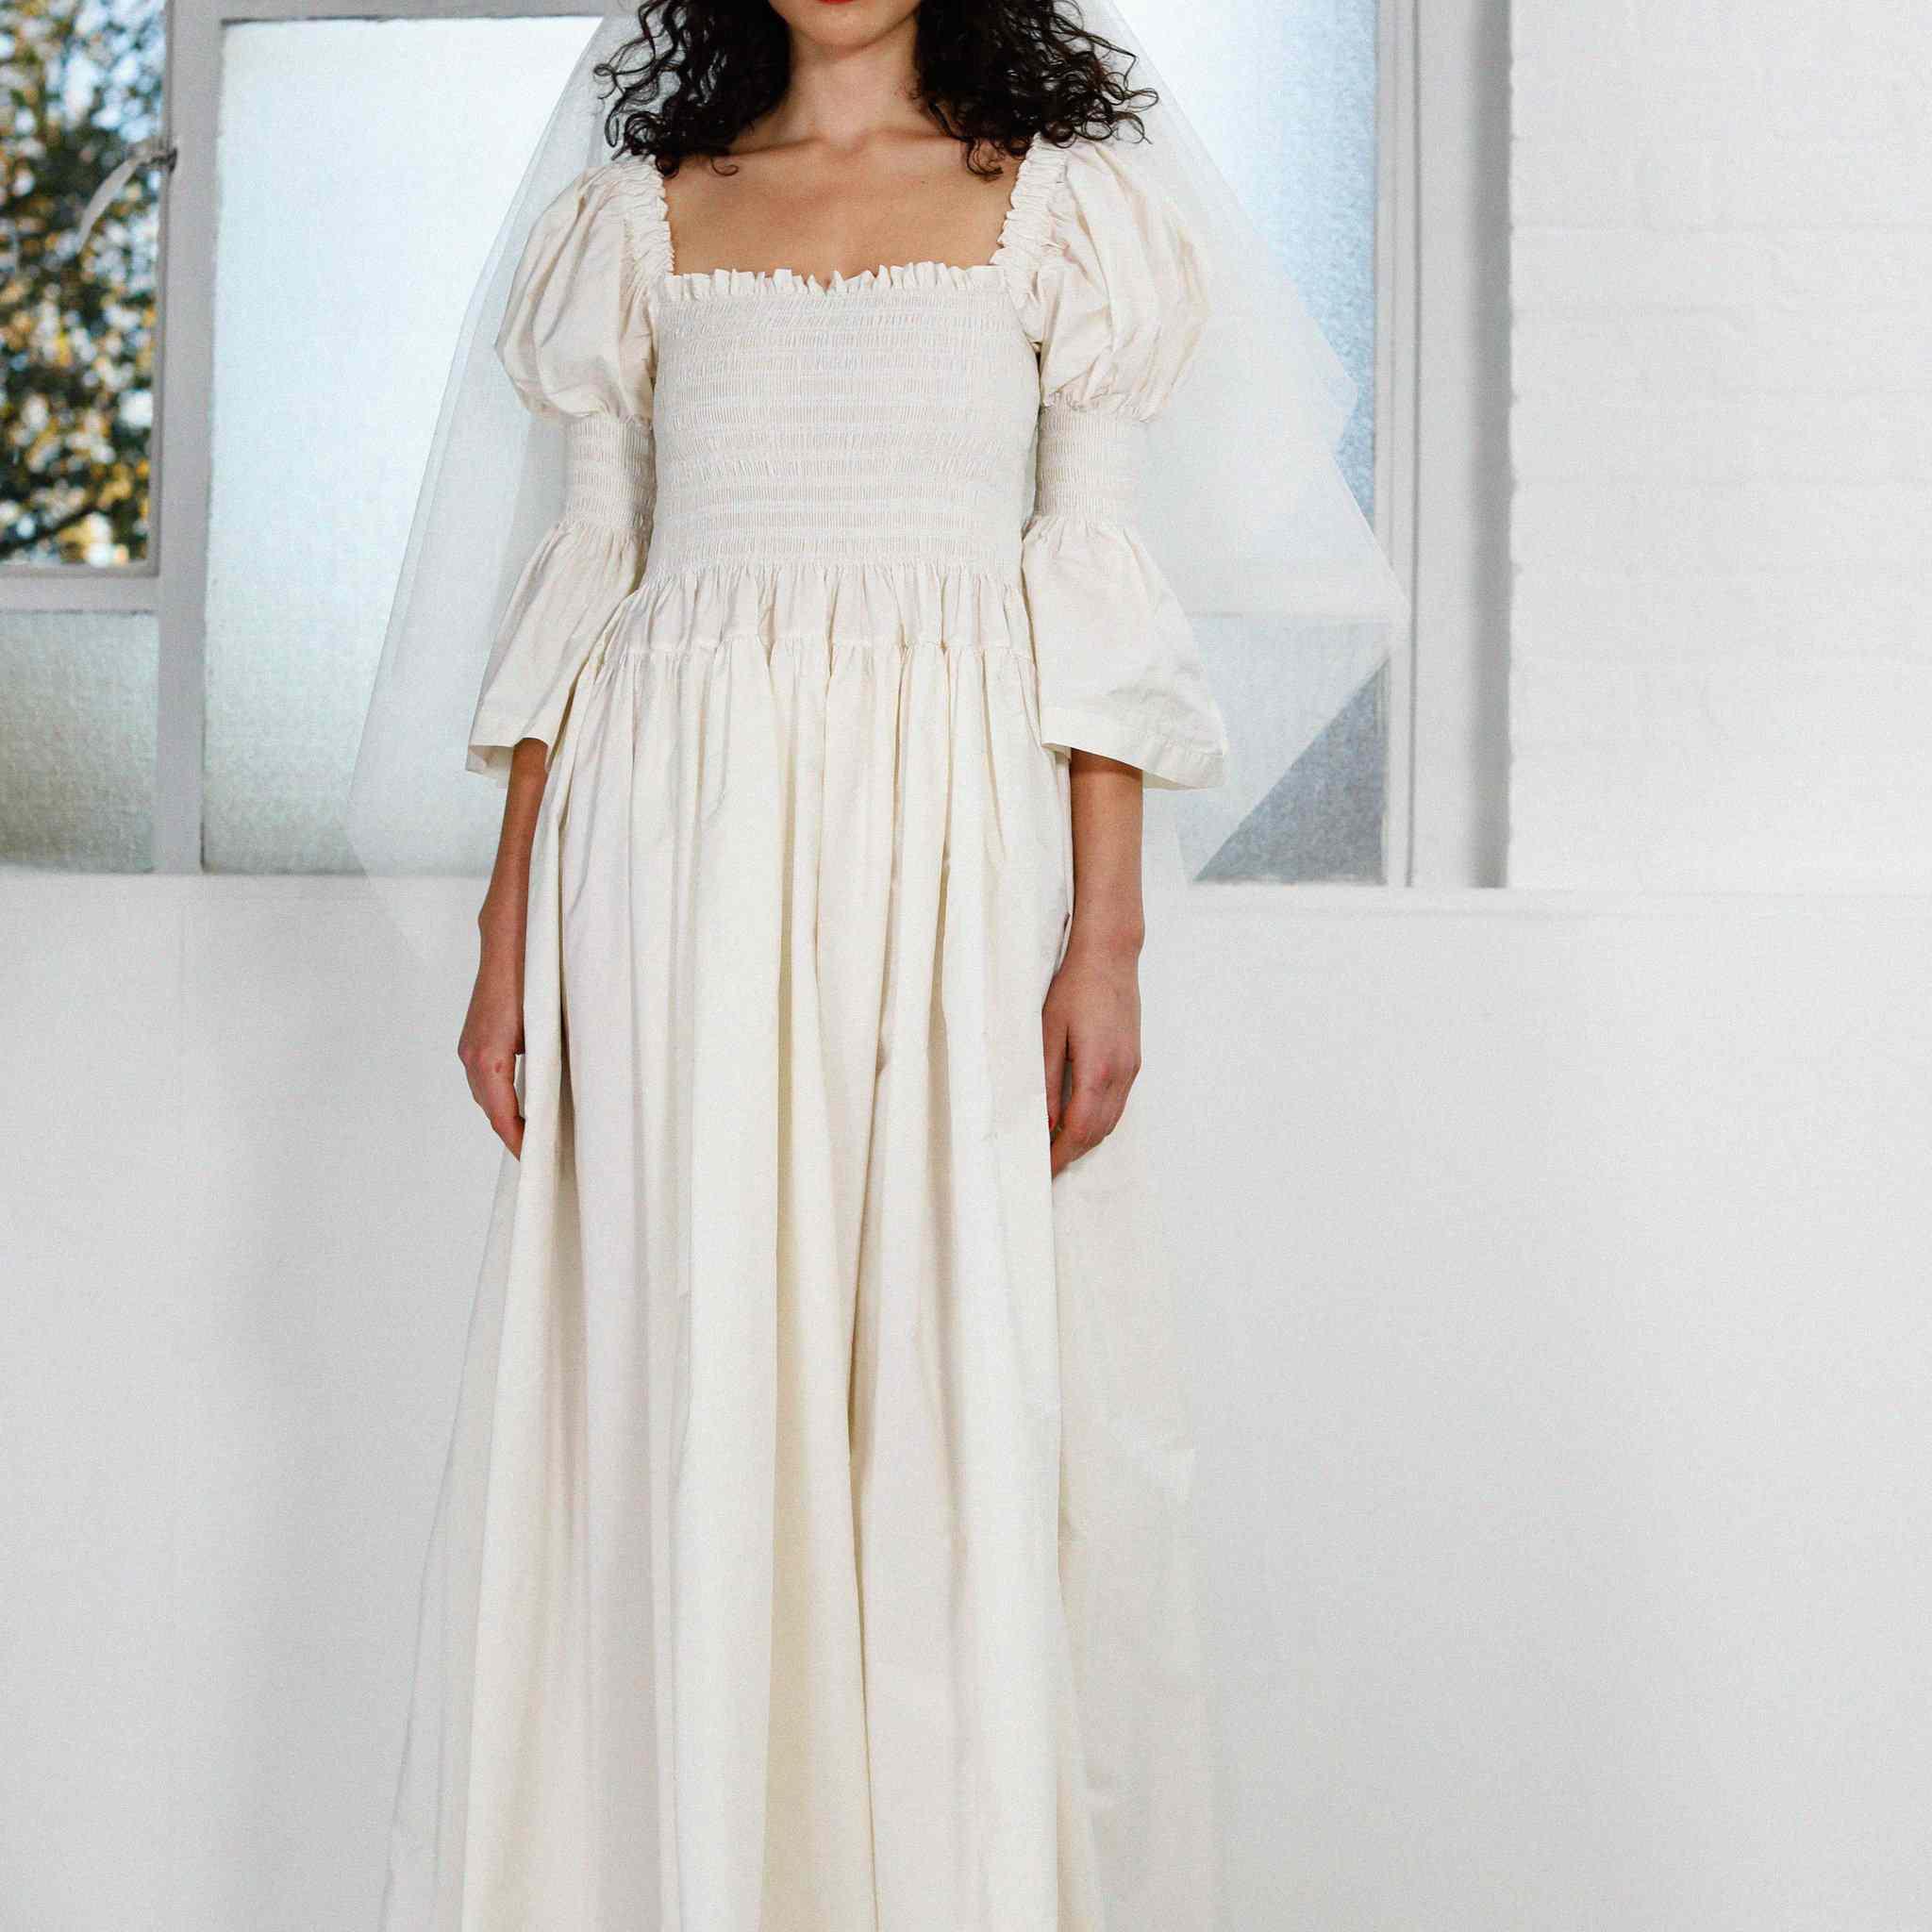 Molly Goddard Violet Dress